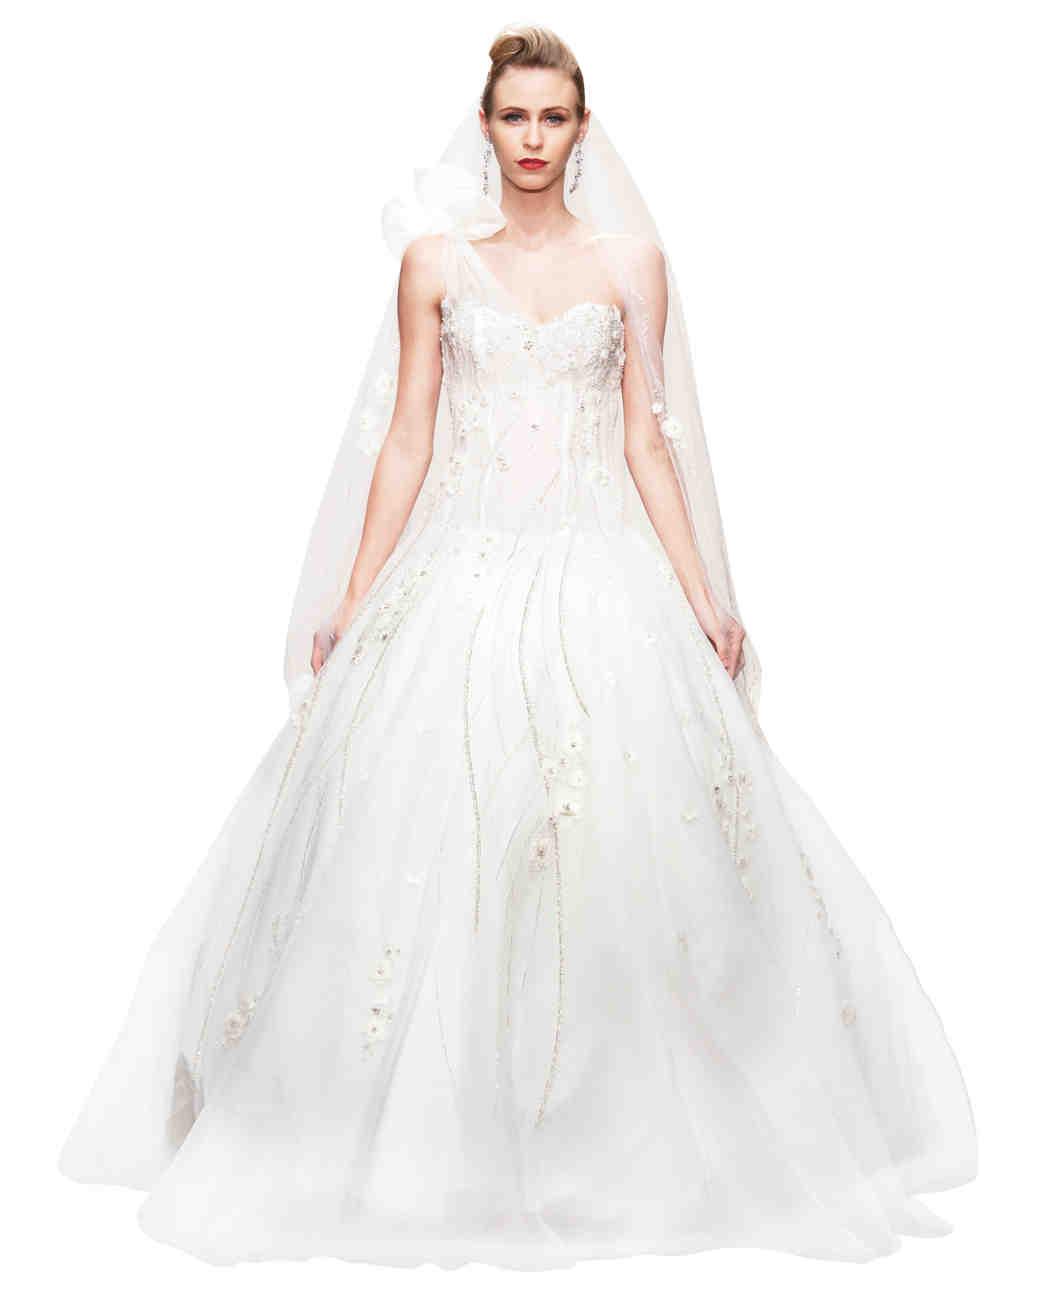 Designers\' Favorite Wedding Dresses | Martha Stewart Weddings